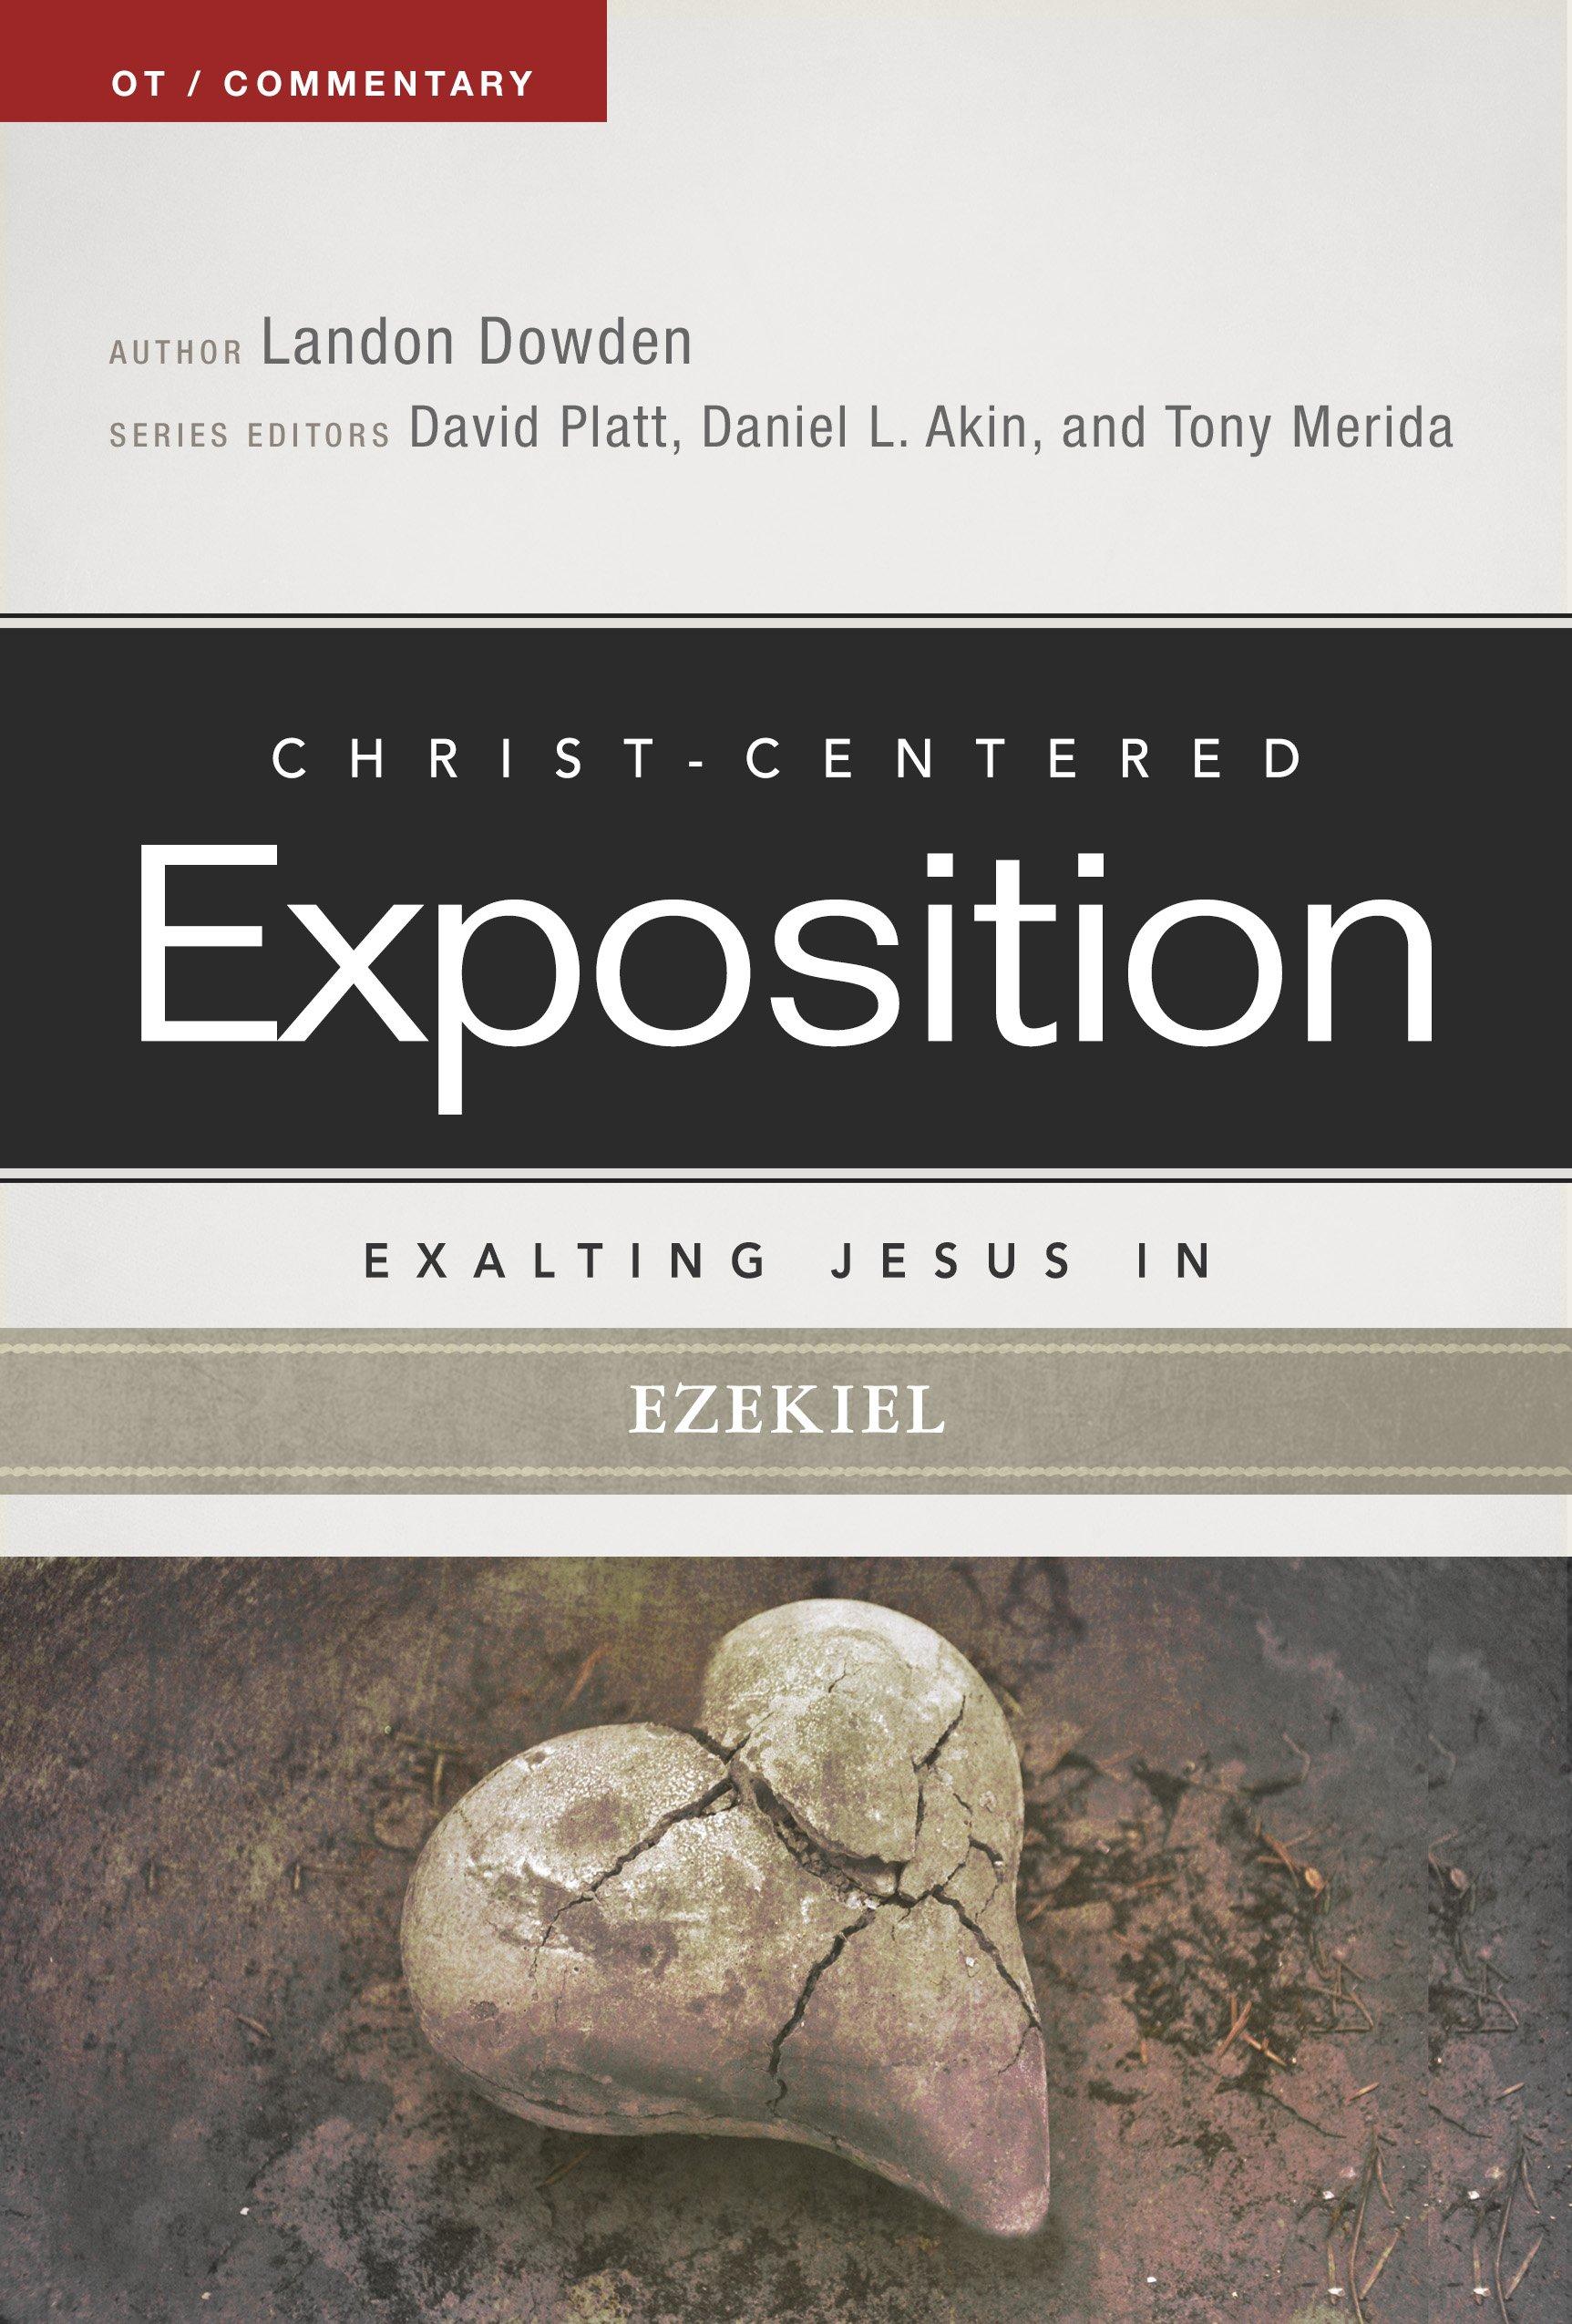 Exalting Jesus in Ezekiel (Christ-Centered Exposition Commentary) ebook